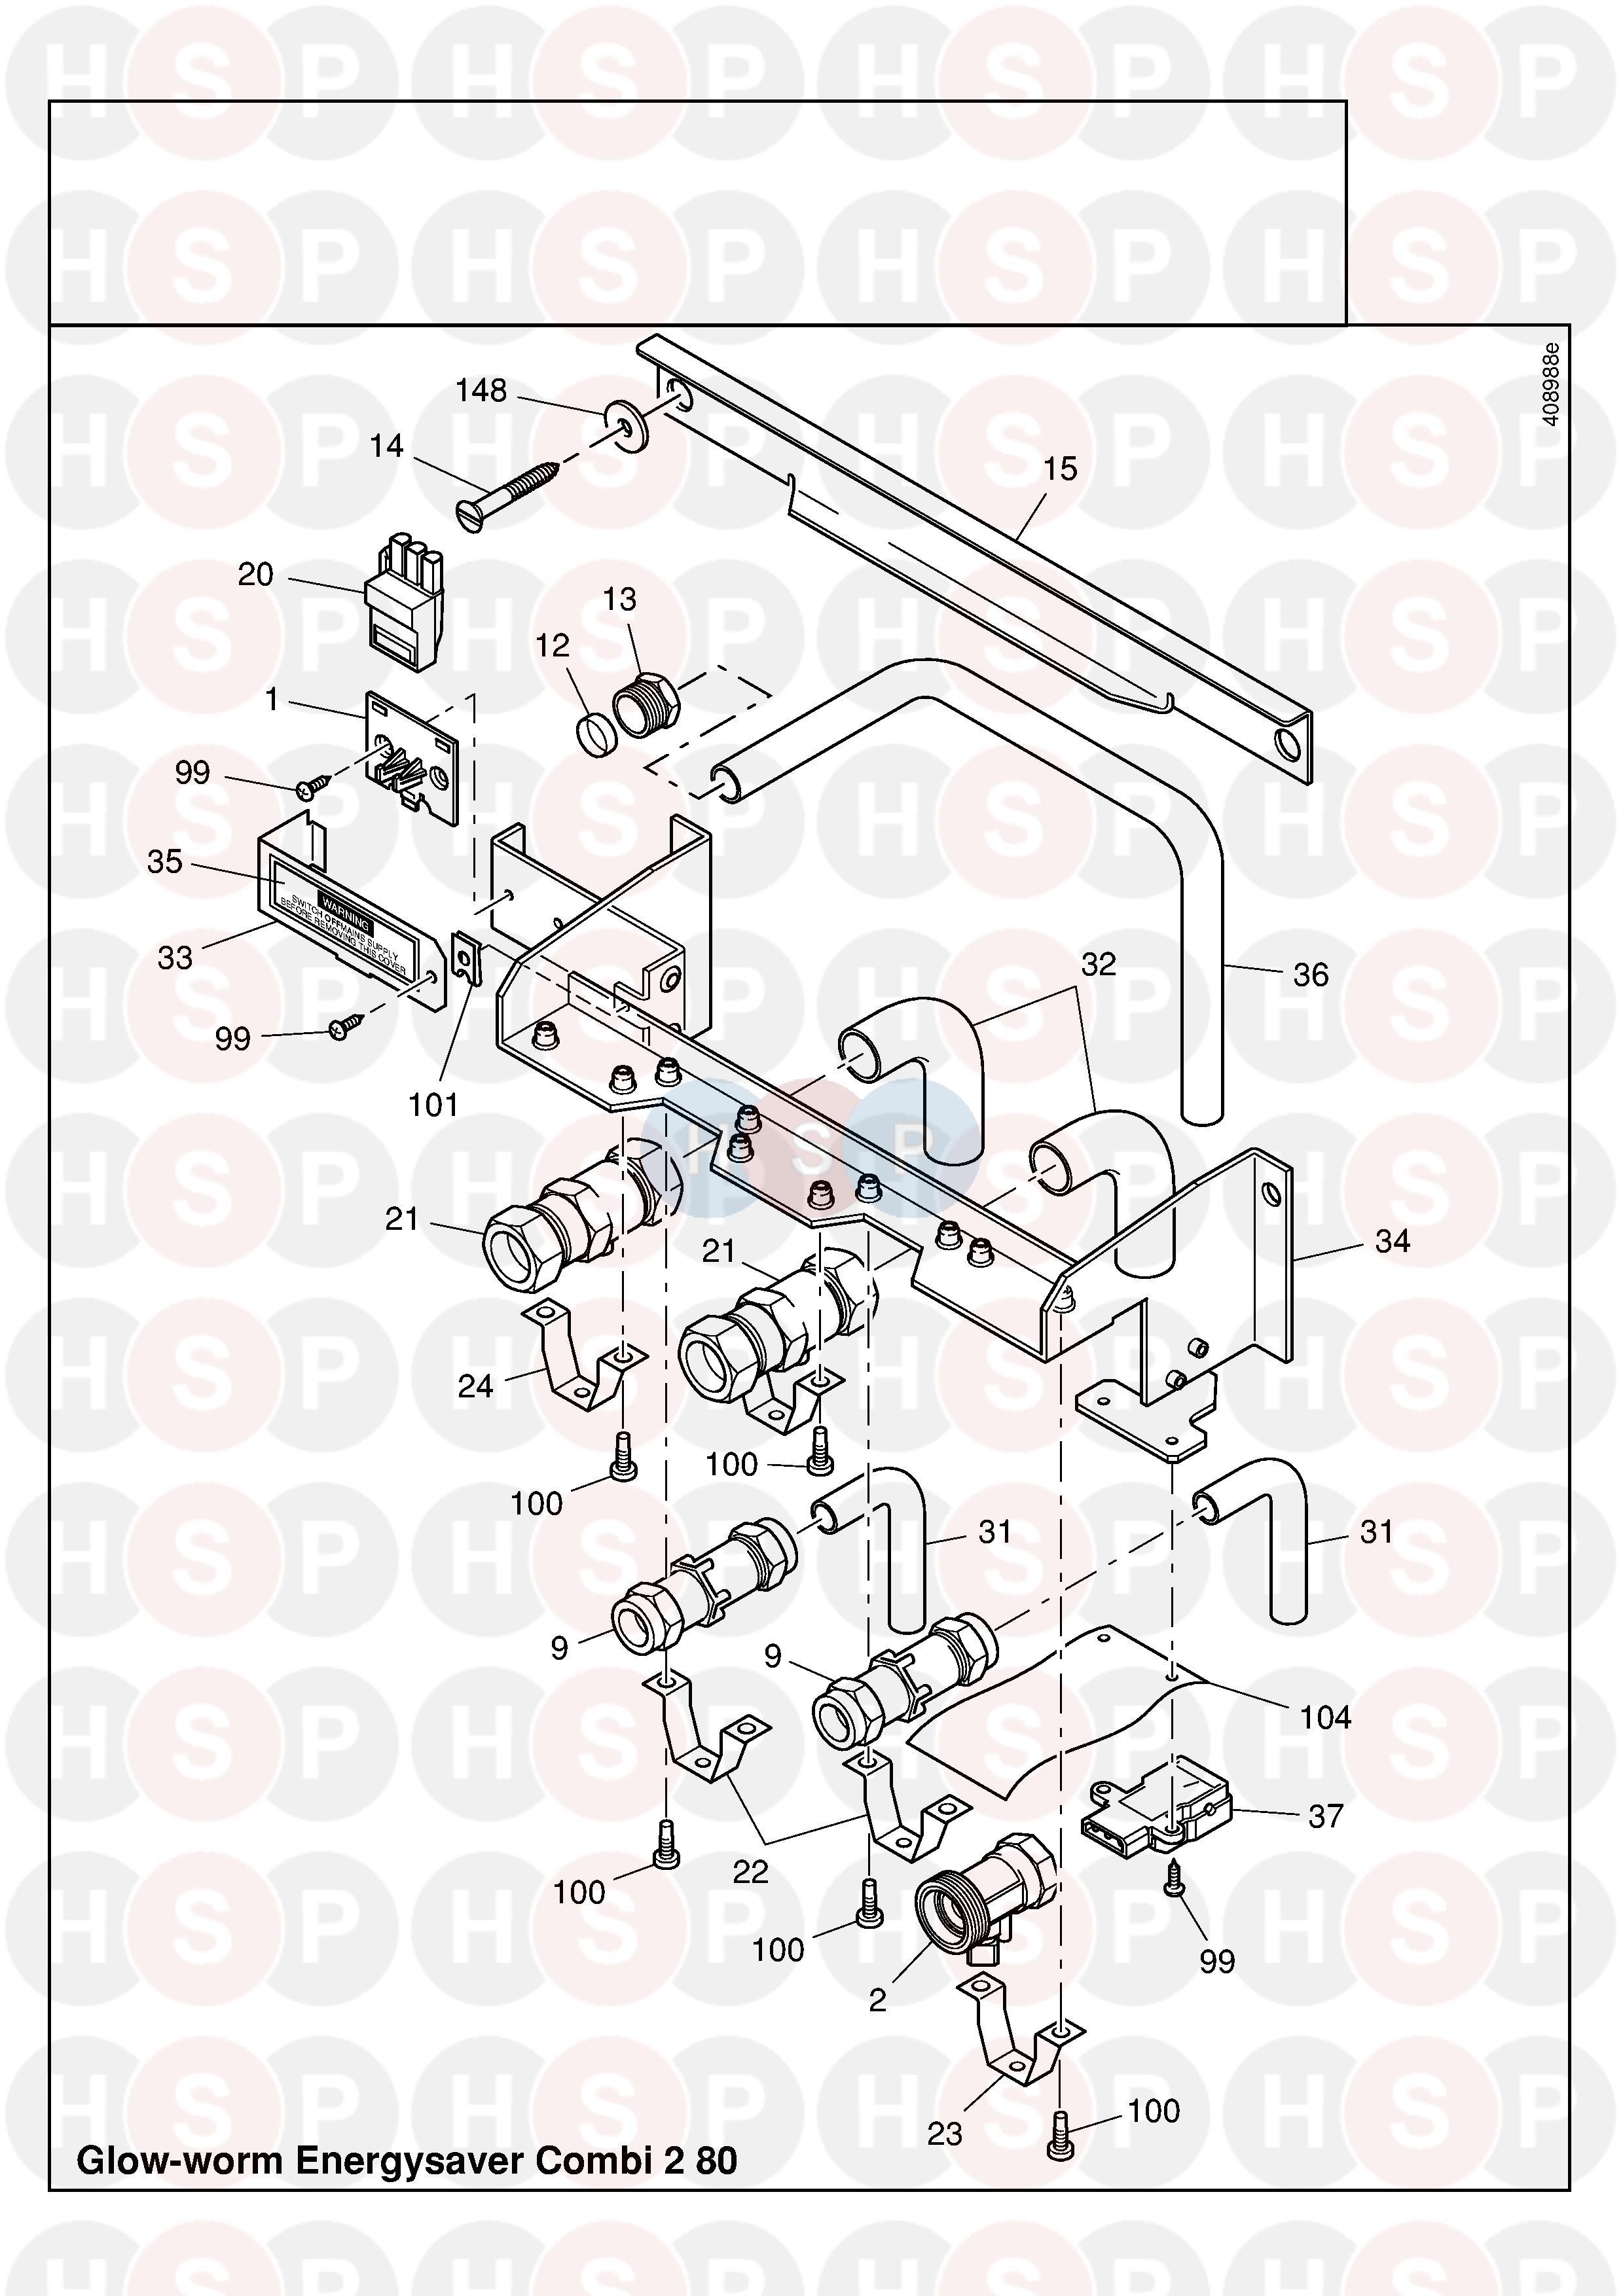 Glowworm ENERGYSAVER COMBI 2 80 (PIPE WORK 2) Diagram